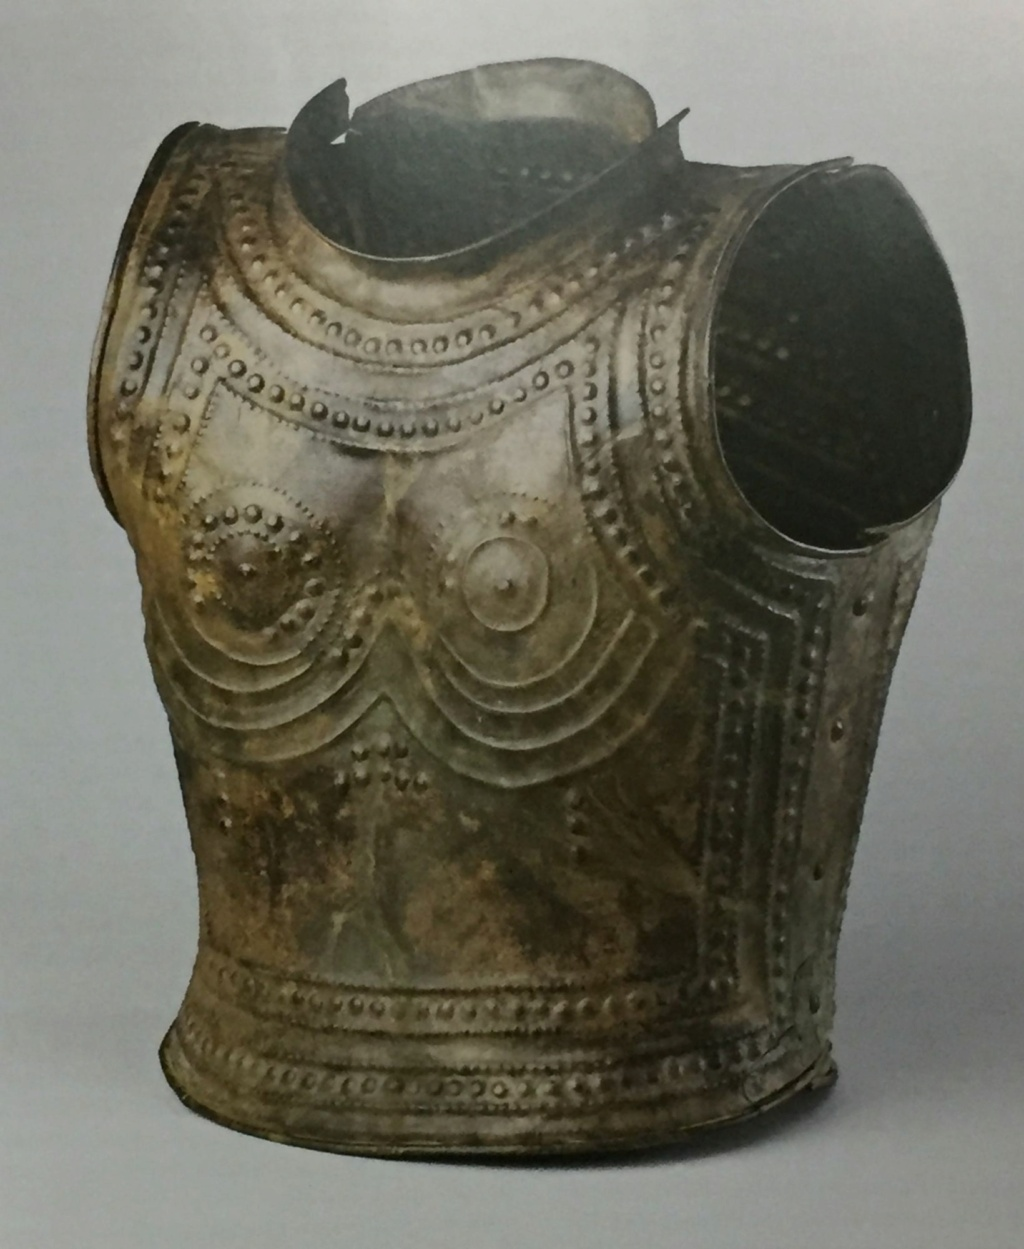 Hoplite Lacédémonien ( Spartiate) Miniart 1/16  M6095-10